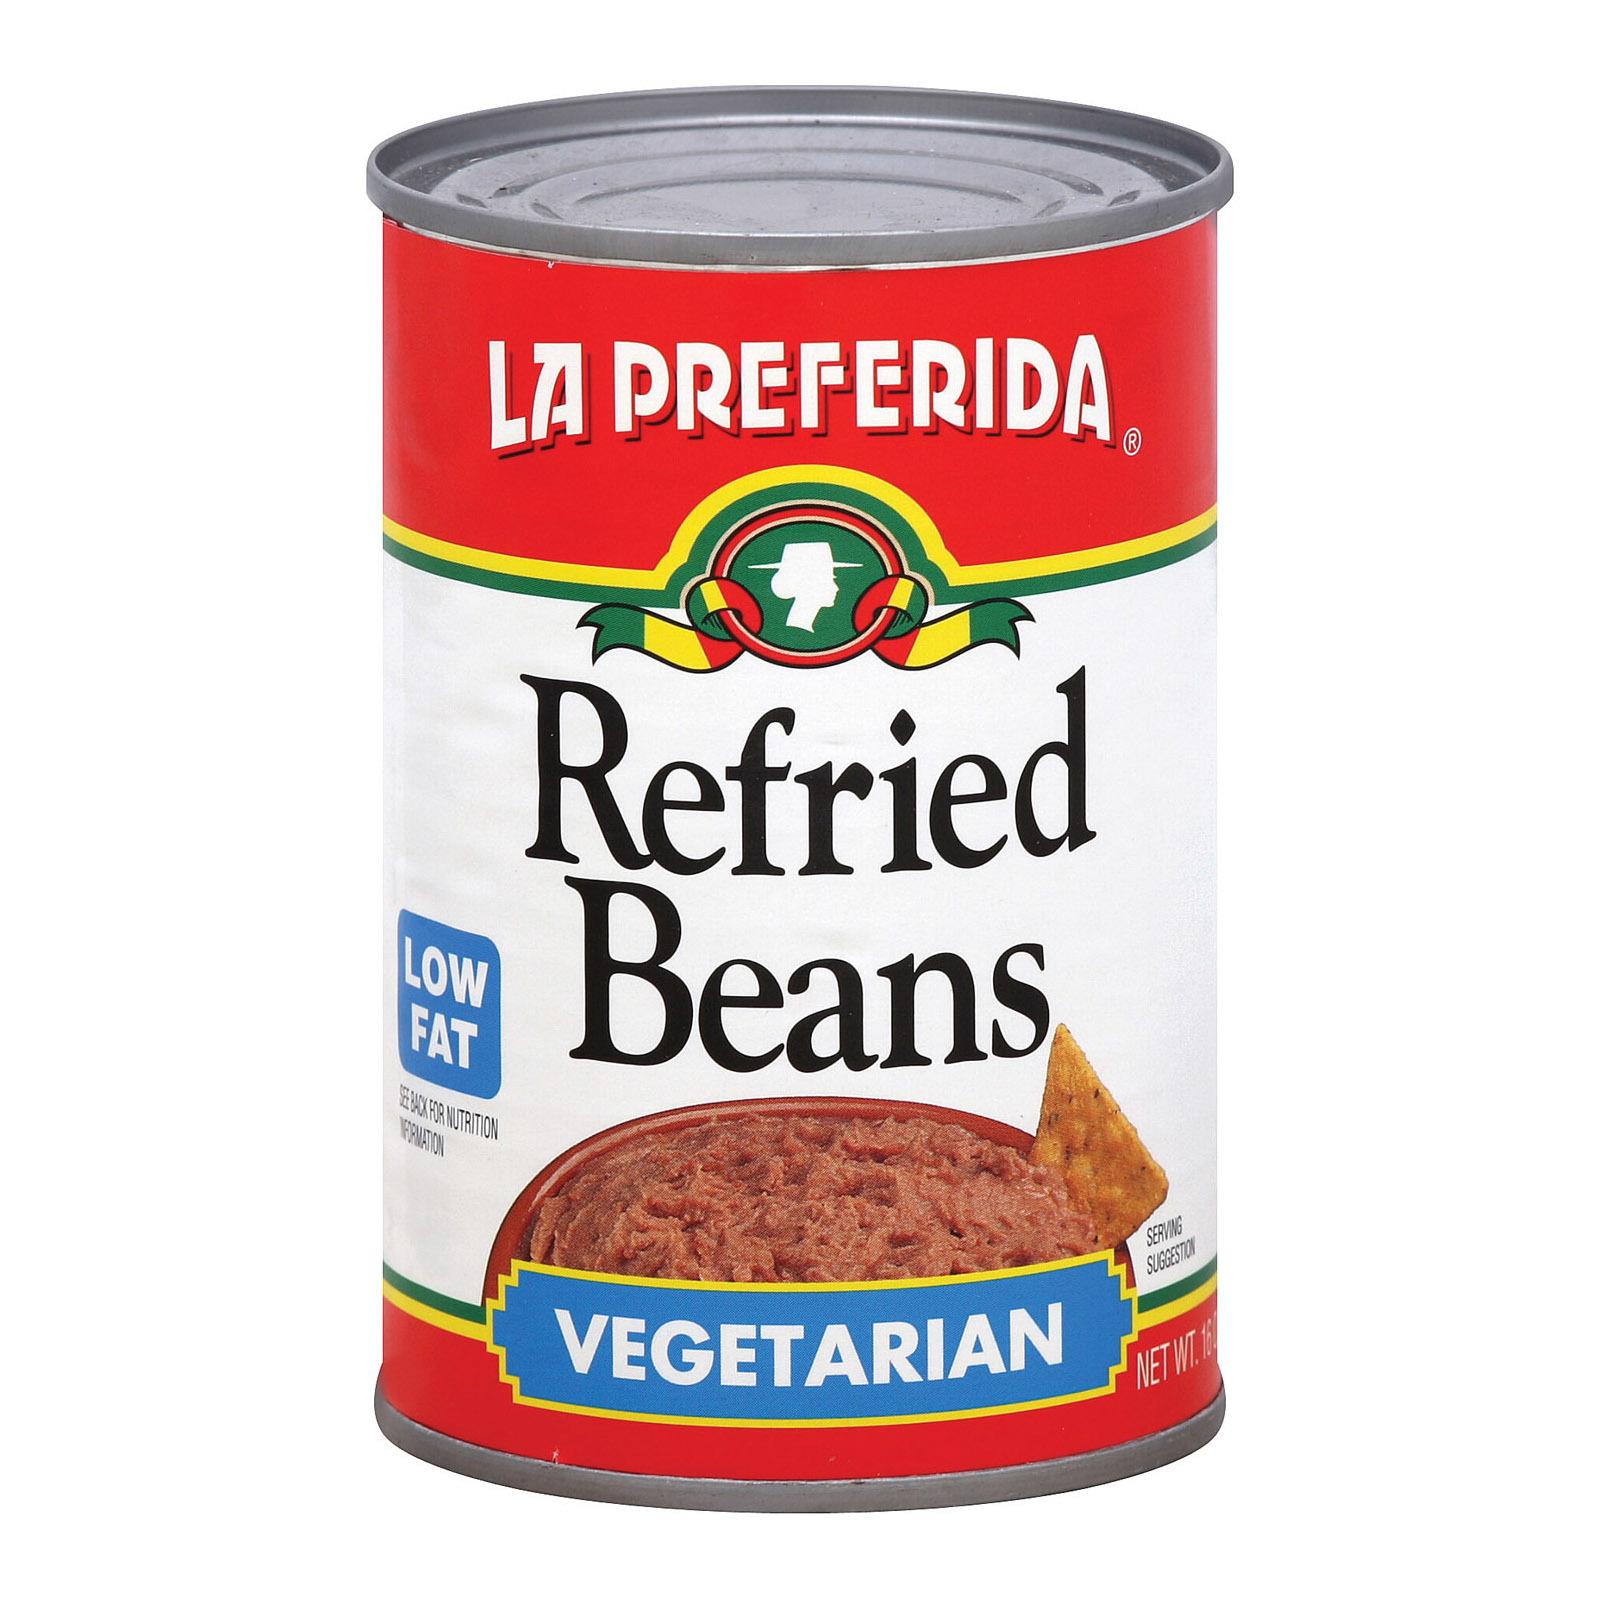 La Preferida Refried Beans - Vegetarian - Case of 12 - 16 oz